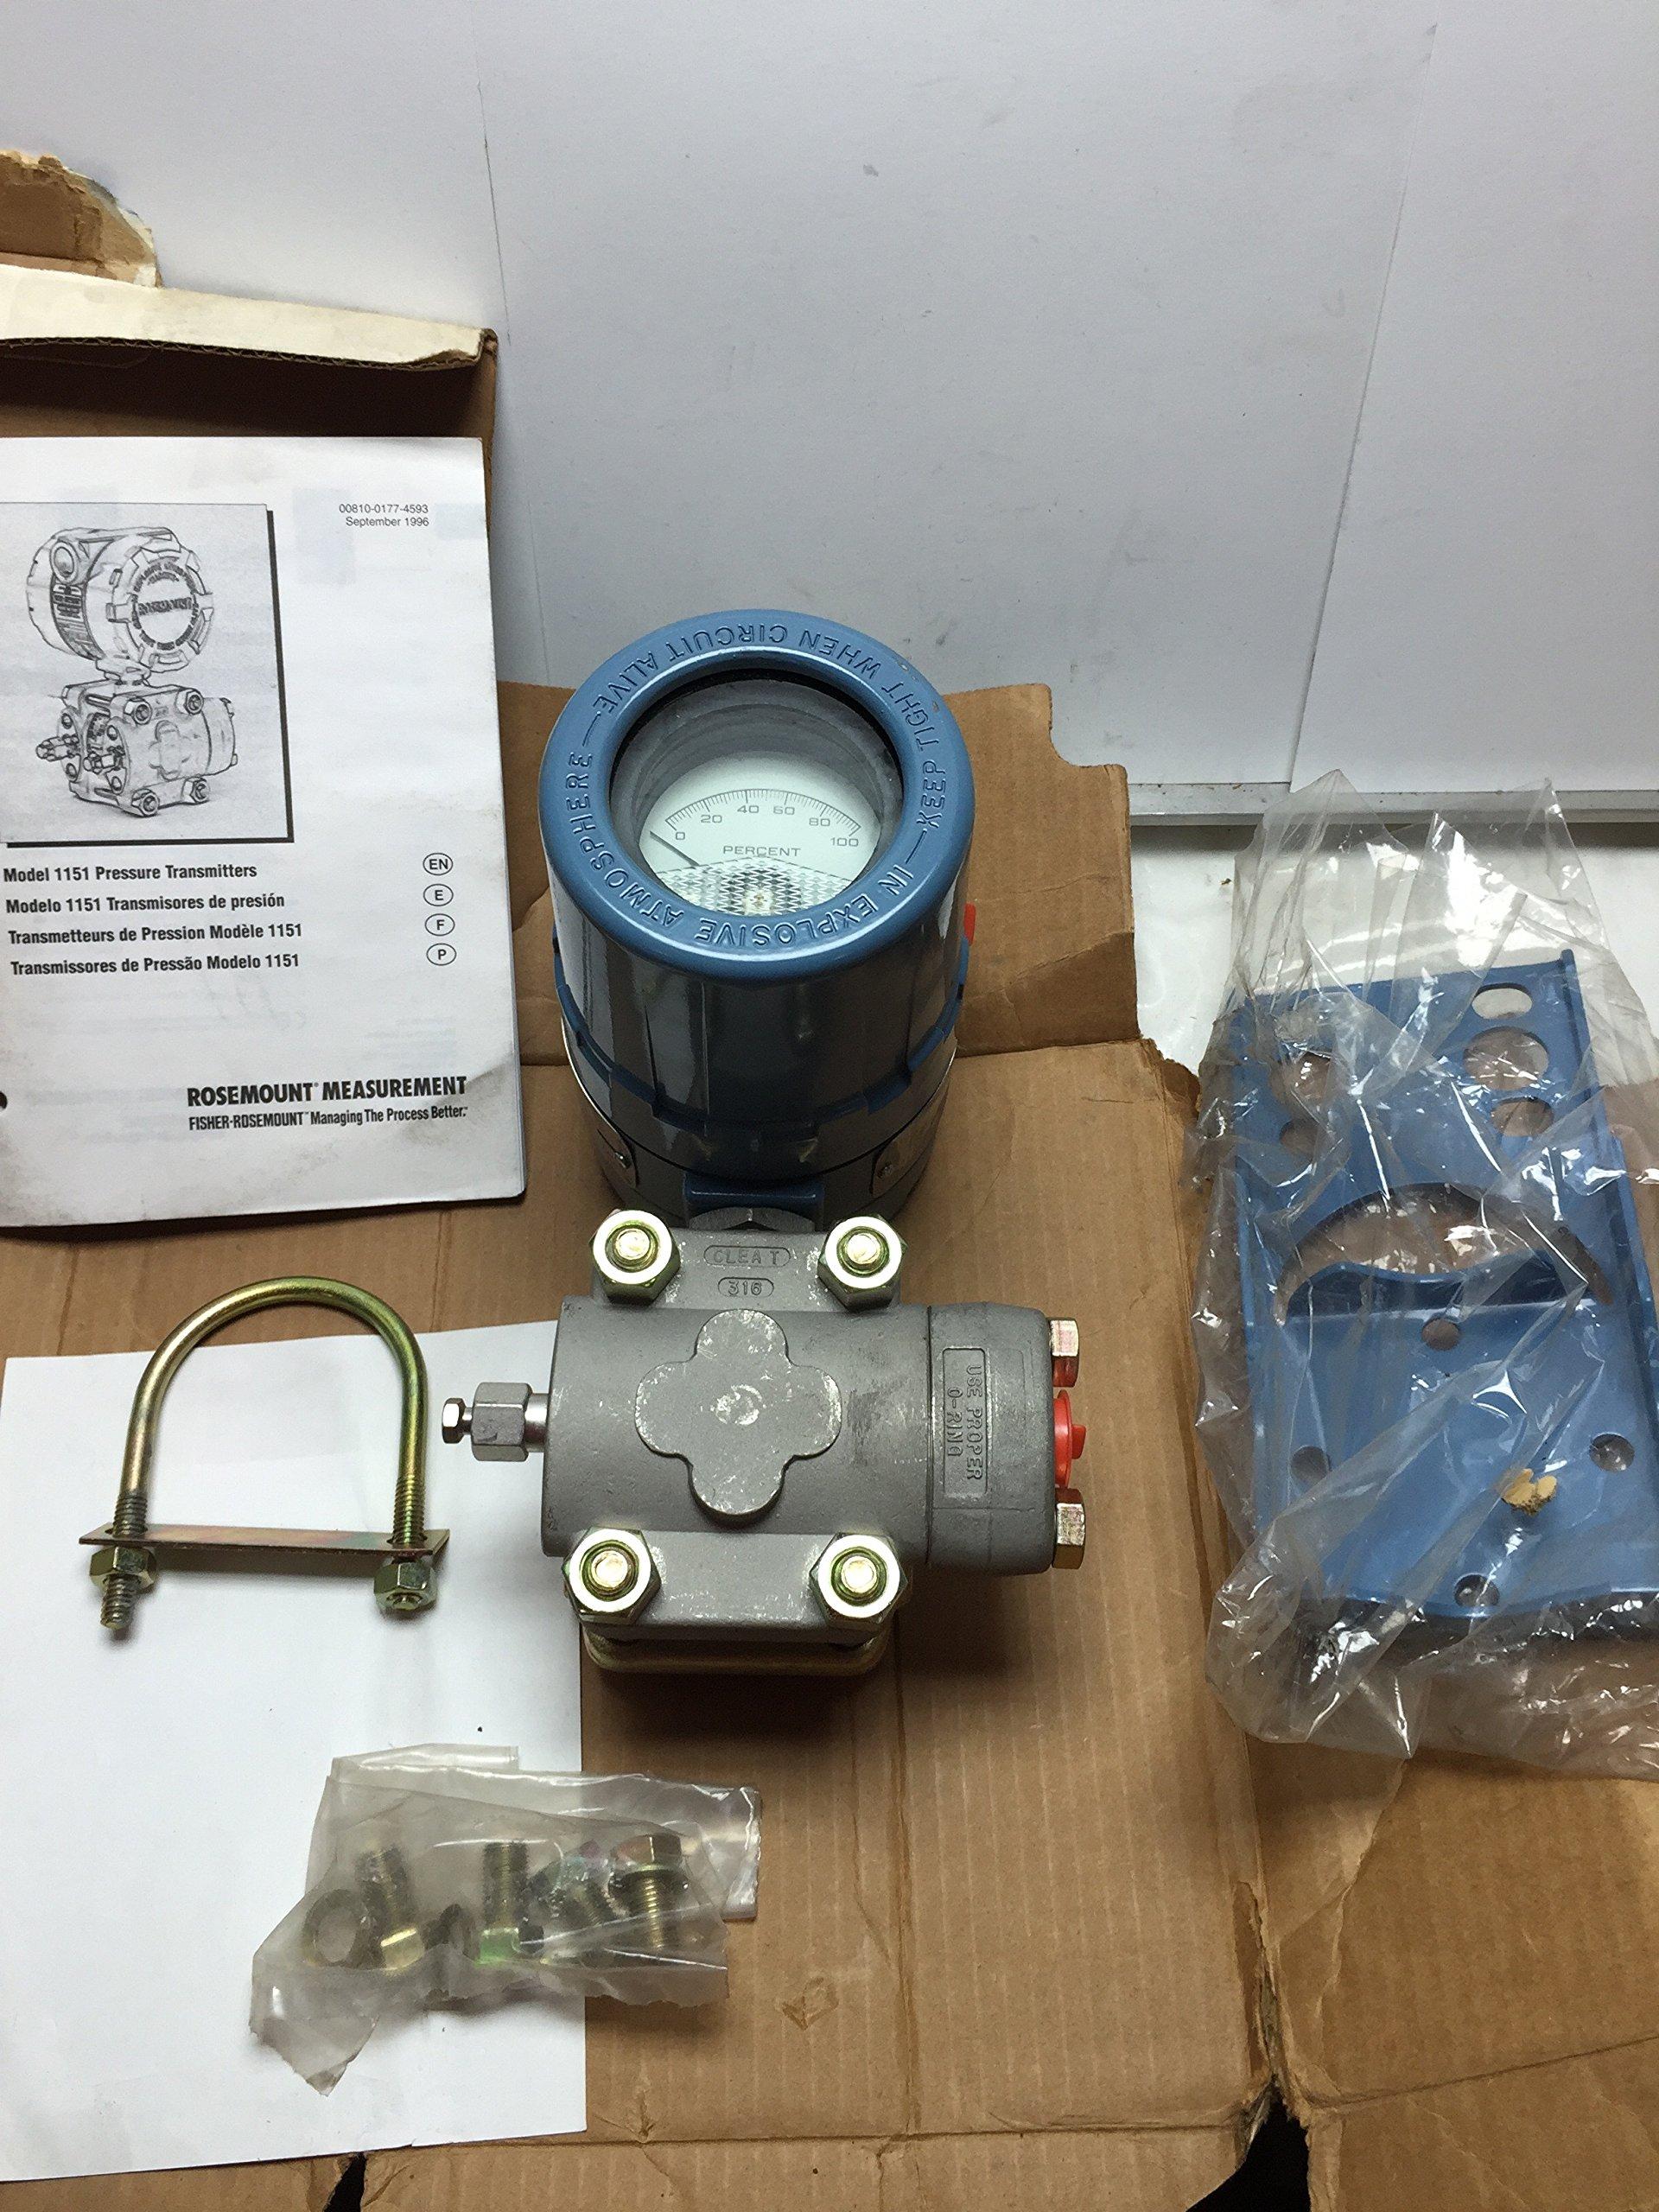 1151Gp4E22M1B3 Transmitter